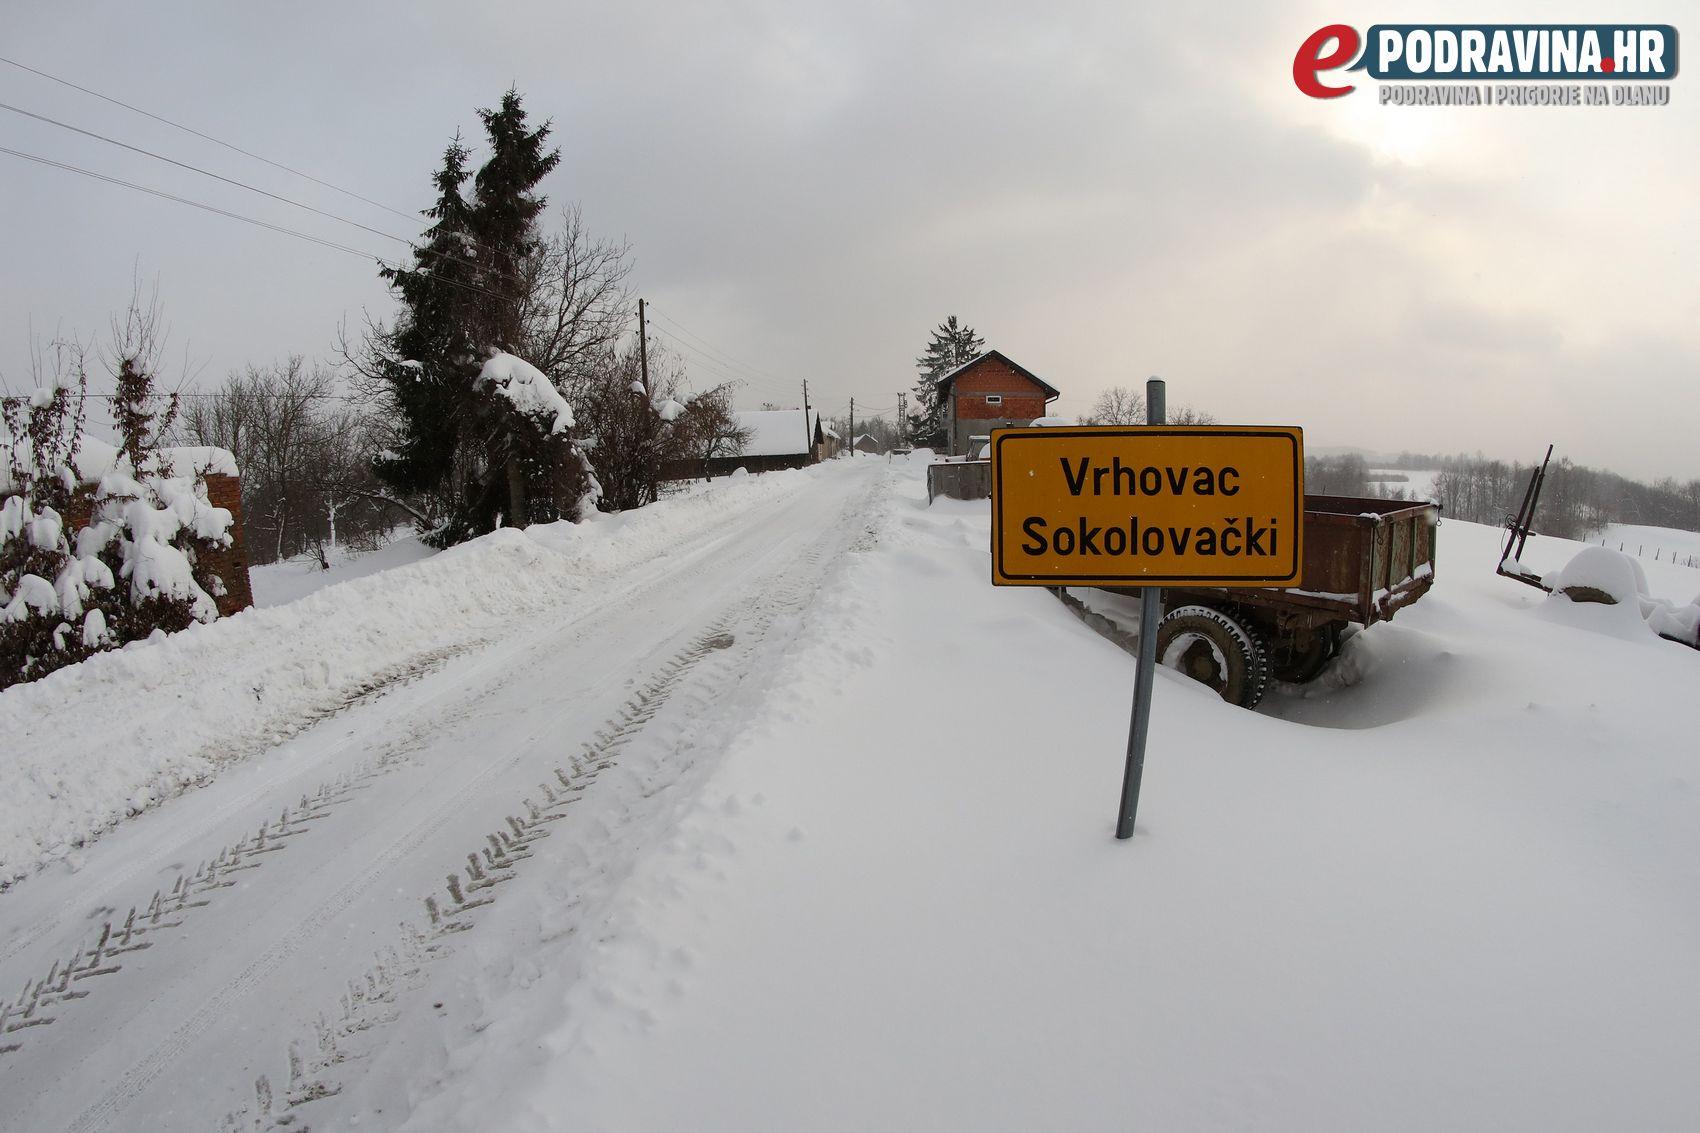 Vrhovac Sokolovečki